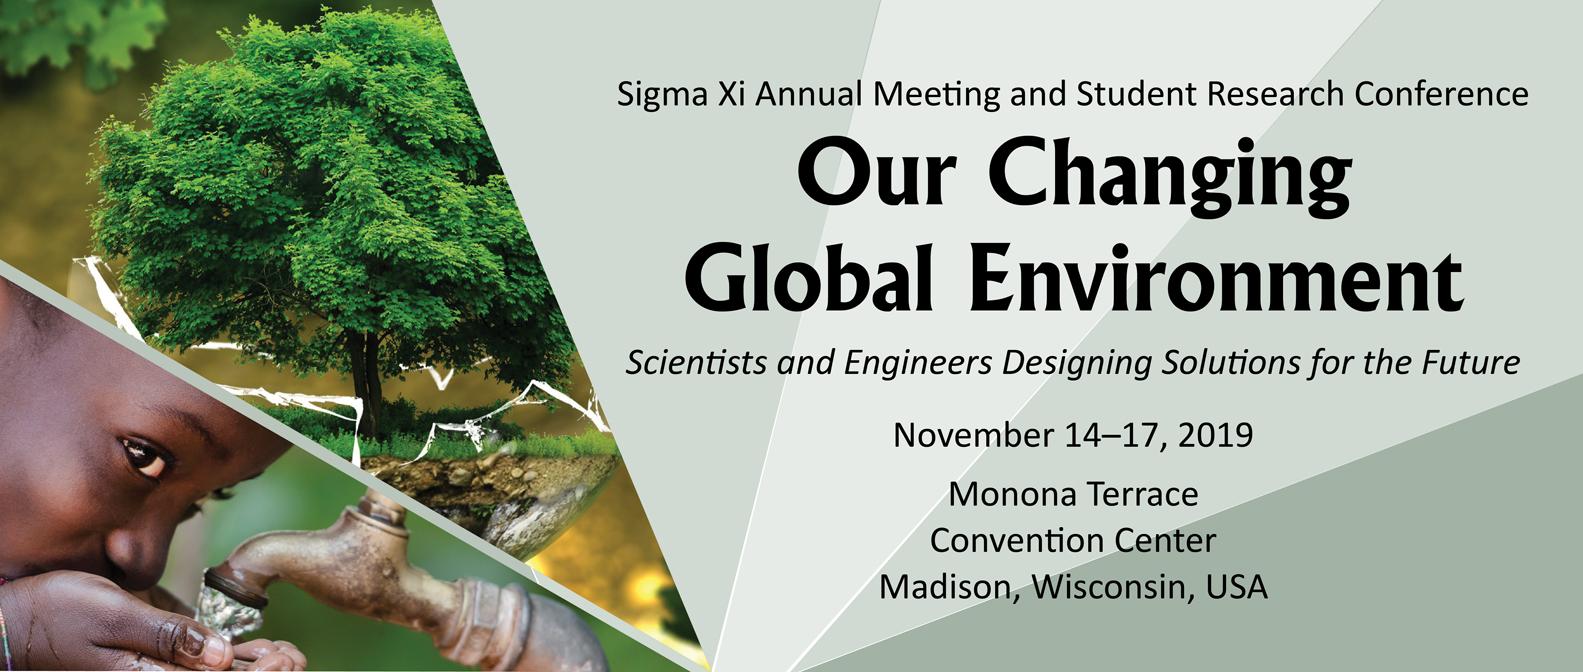 Global Environment website banner Large